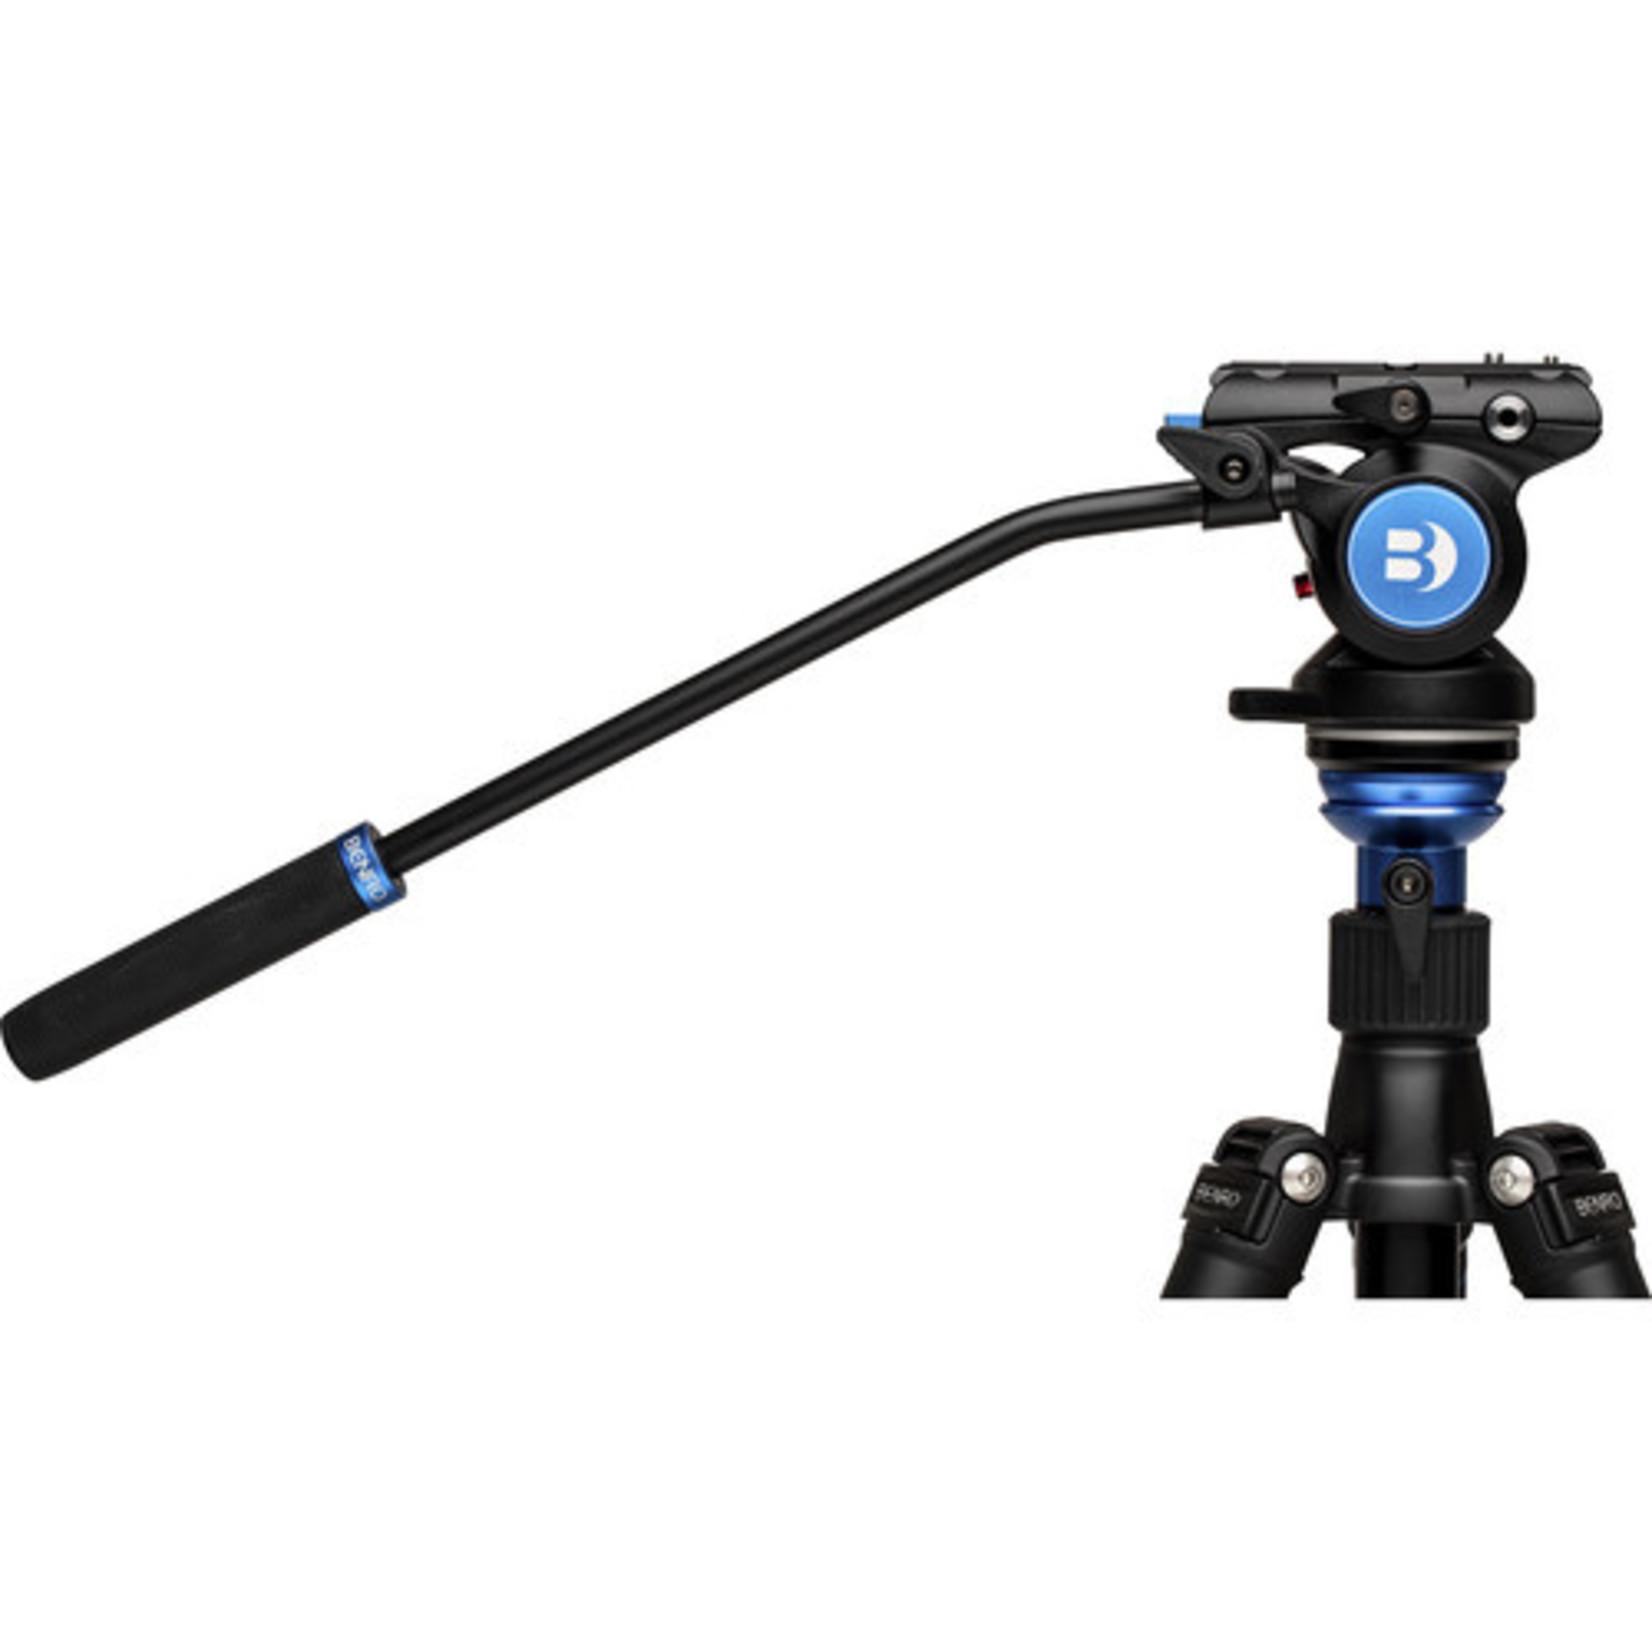 Benro Benro S4Pro Fluid Video Head